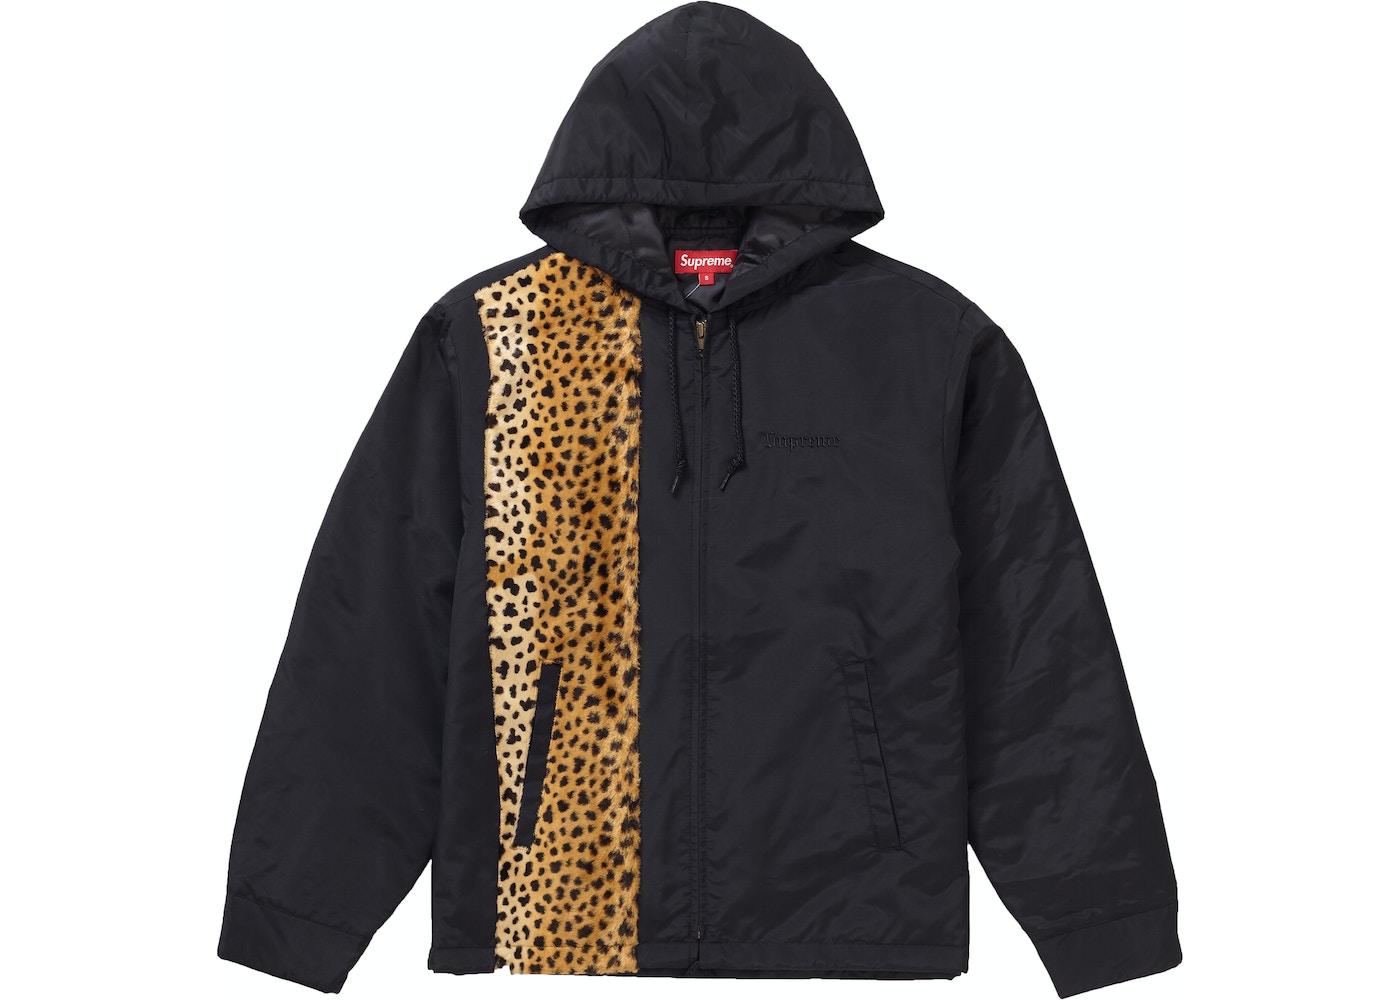 153d8620bfc1 Streetwear - Supreme Jackets - Lowest Ask